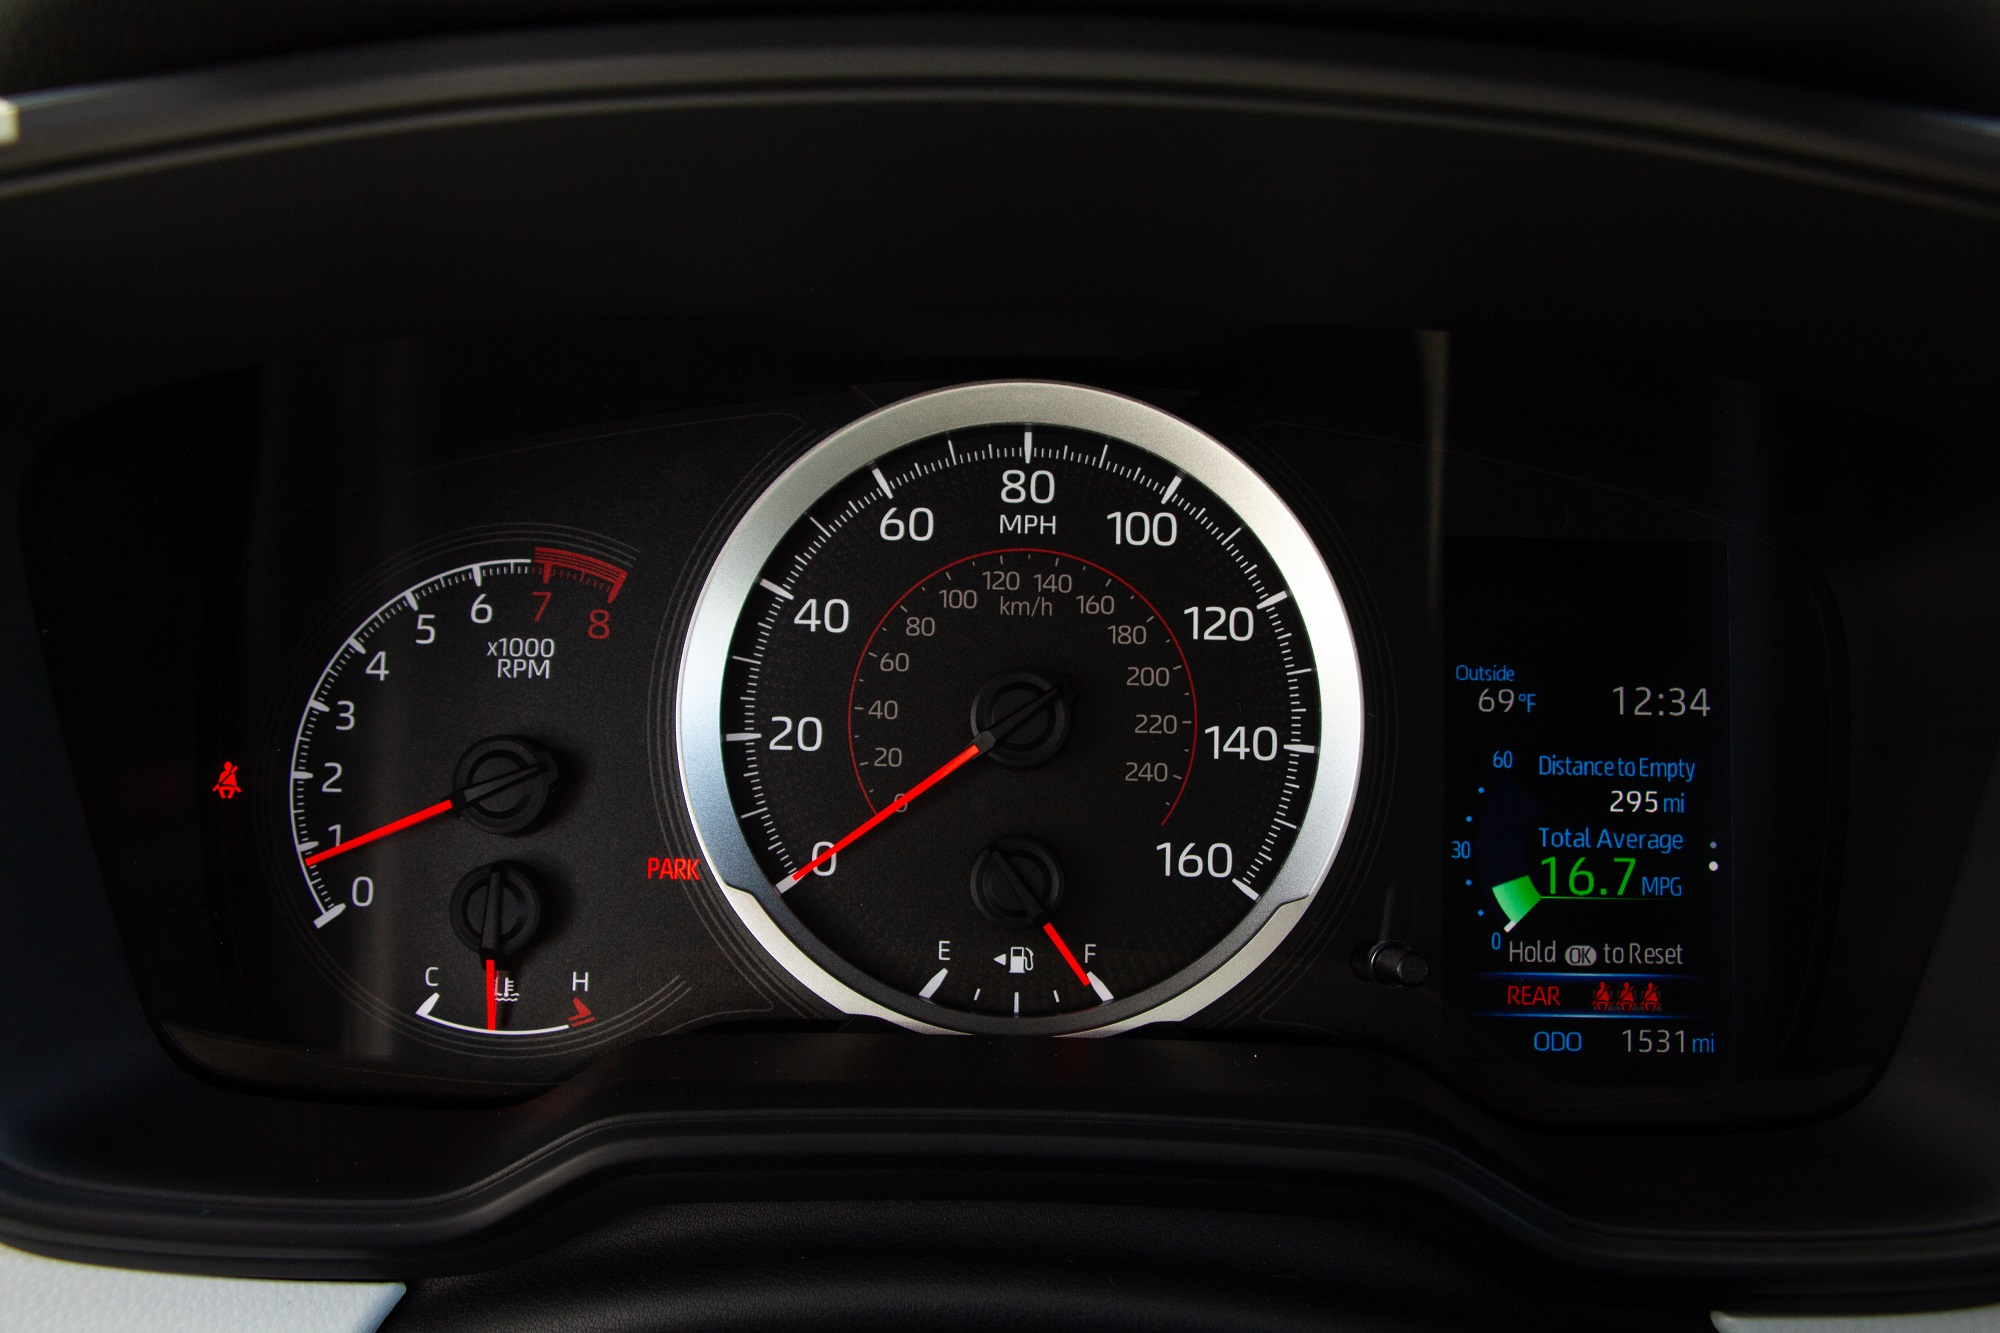 2020 Toyota Corolla SE Manual Transmission